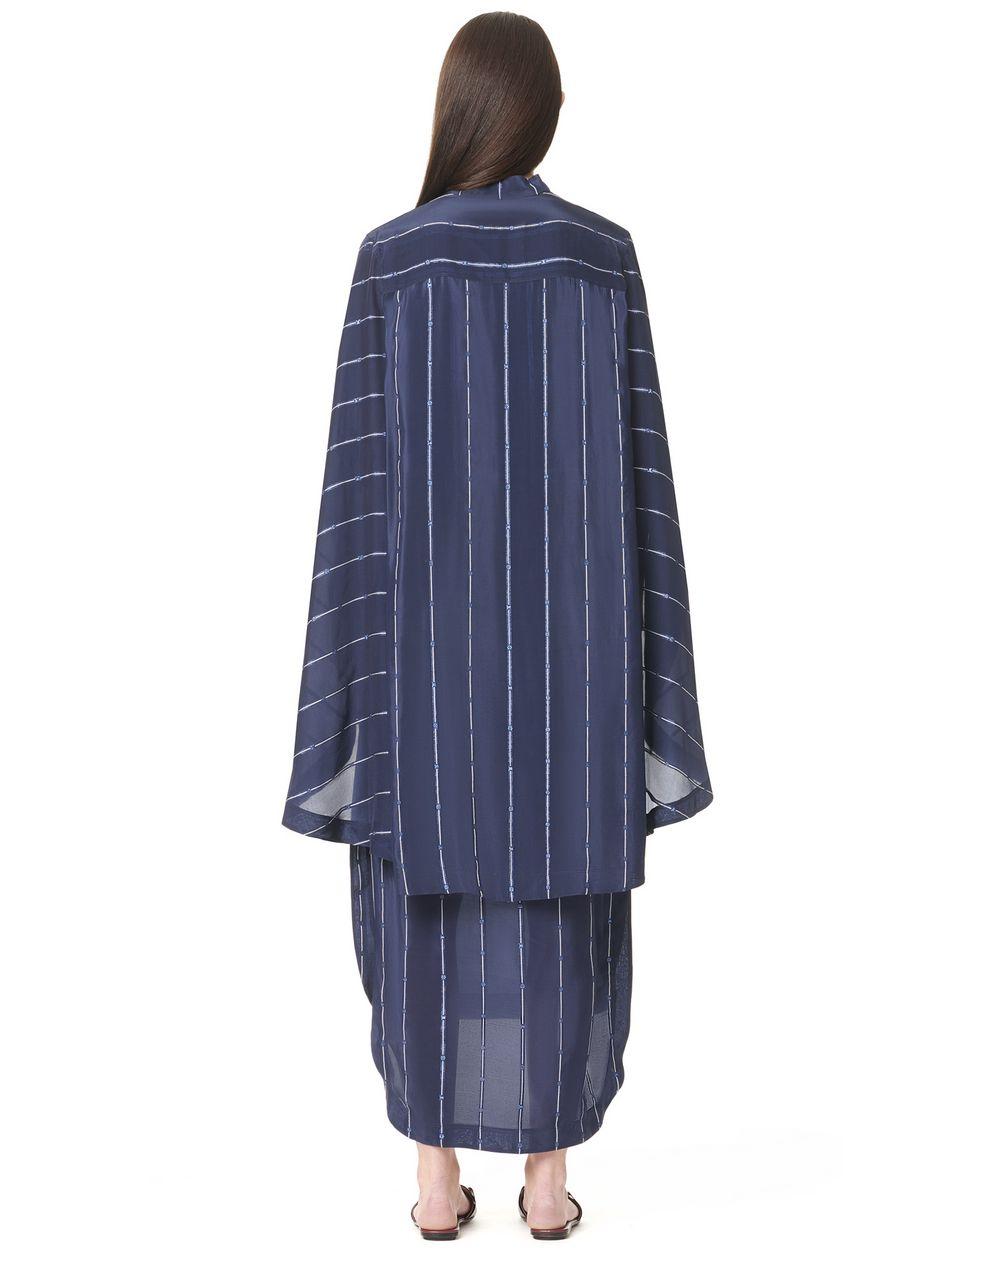 CAPE KAFTAN DRESS - Lanvin